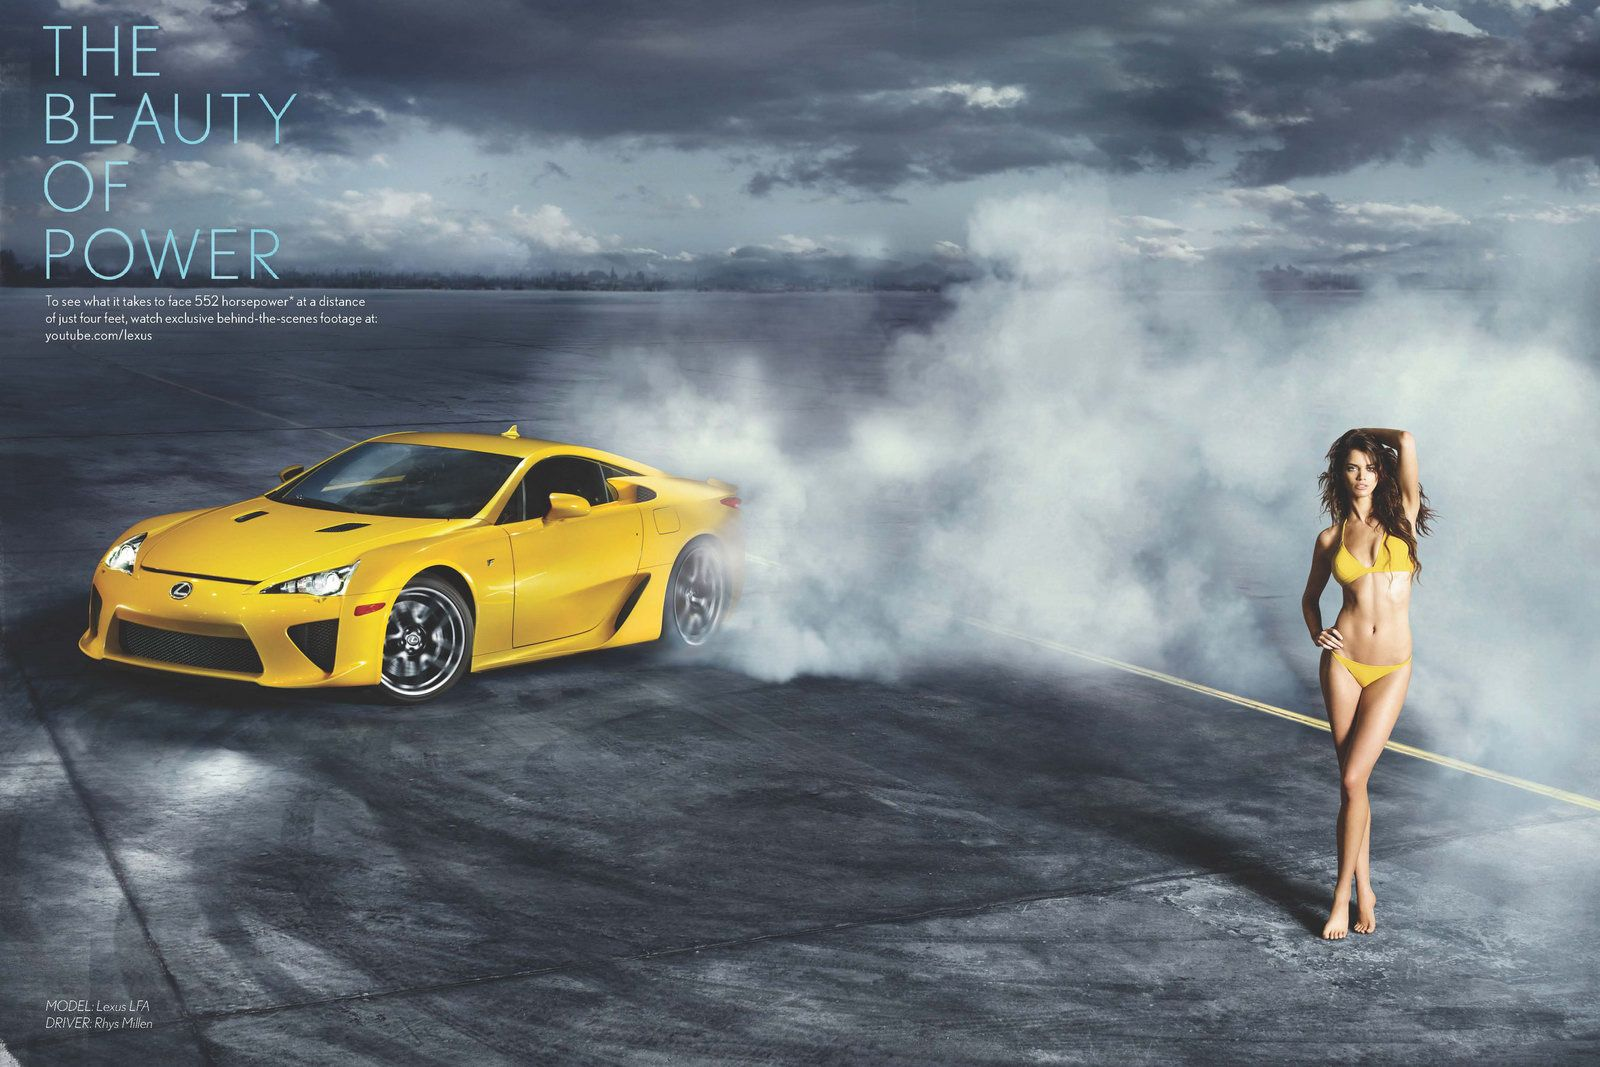 Lexus LFA Meets Hot Dutch Supermodel